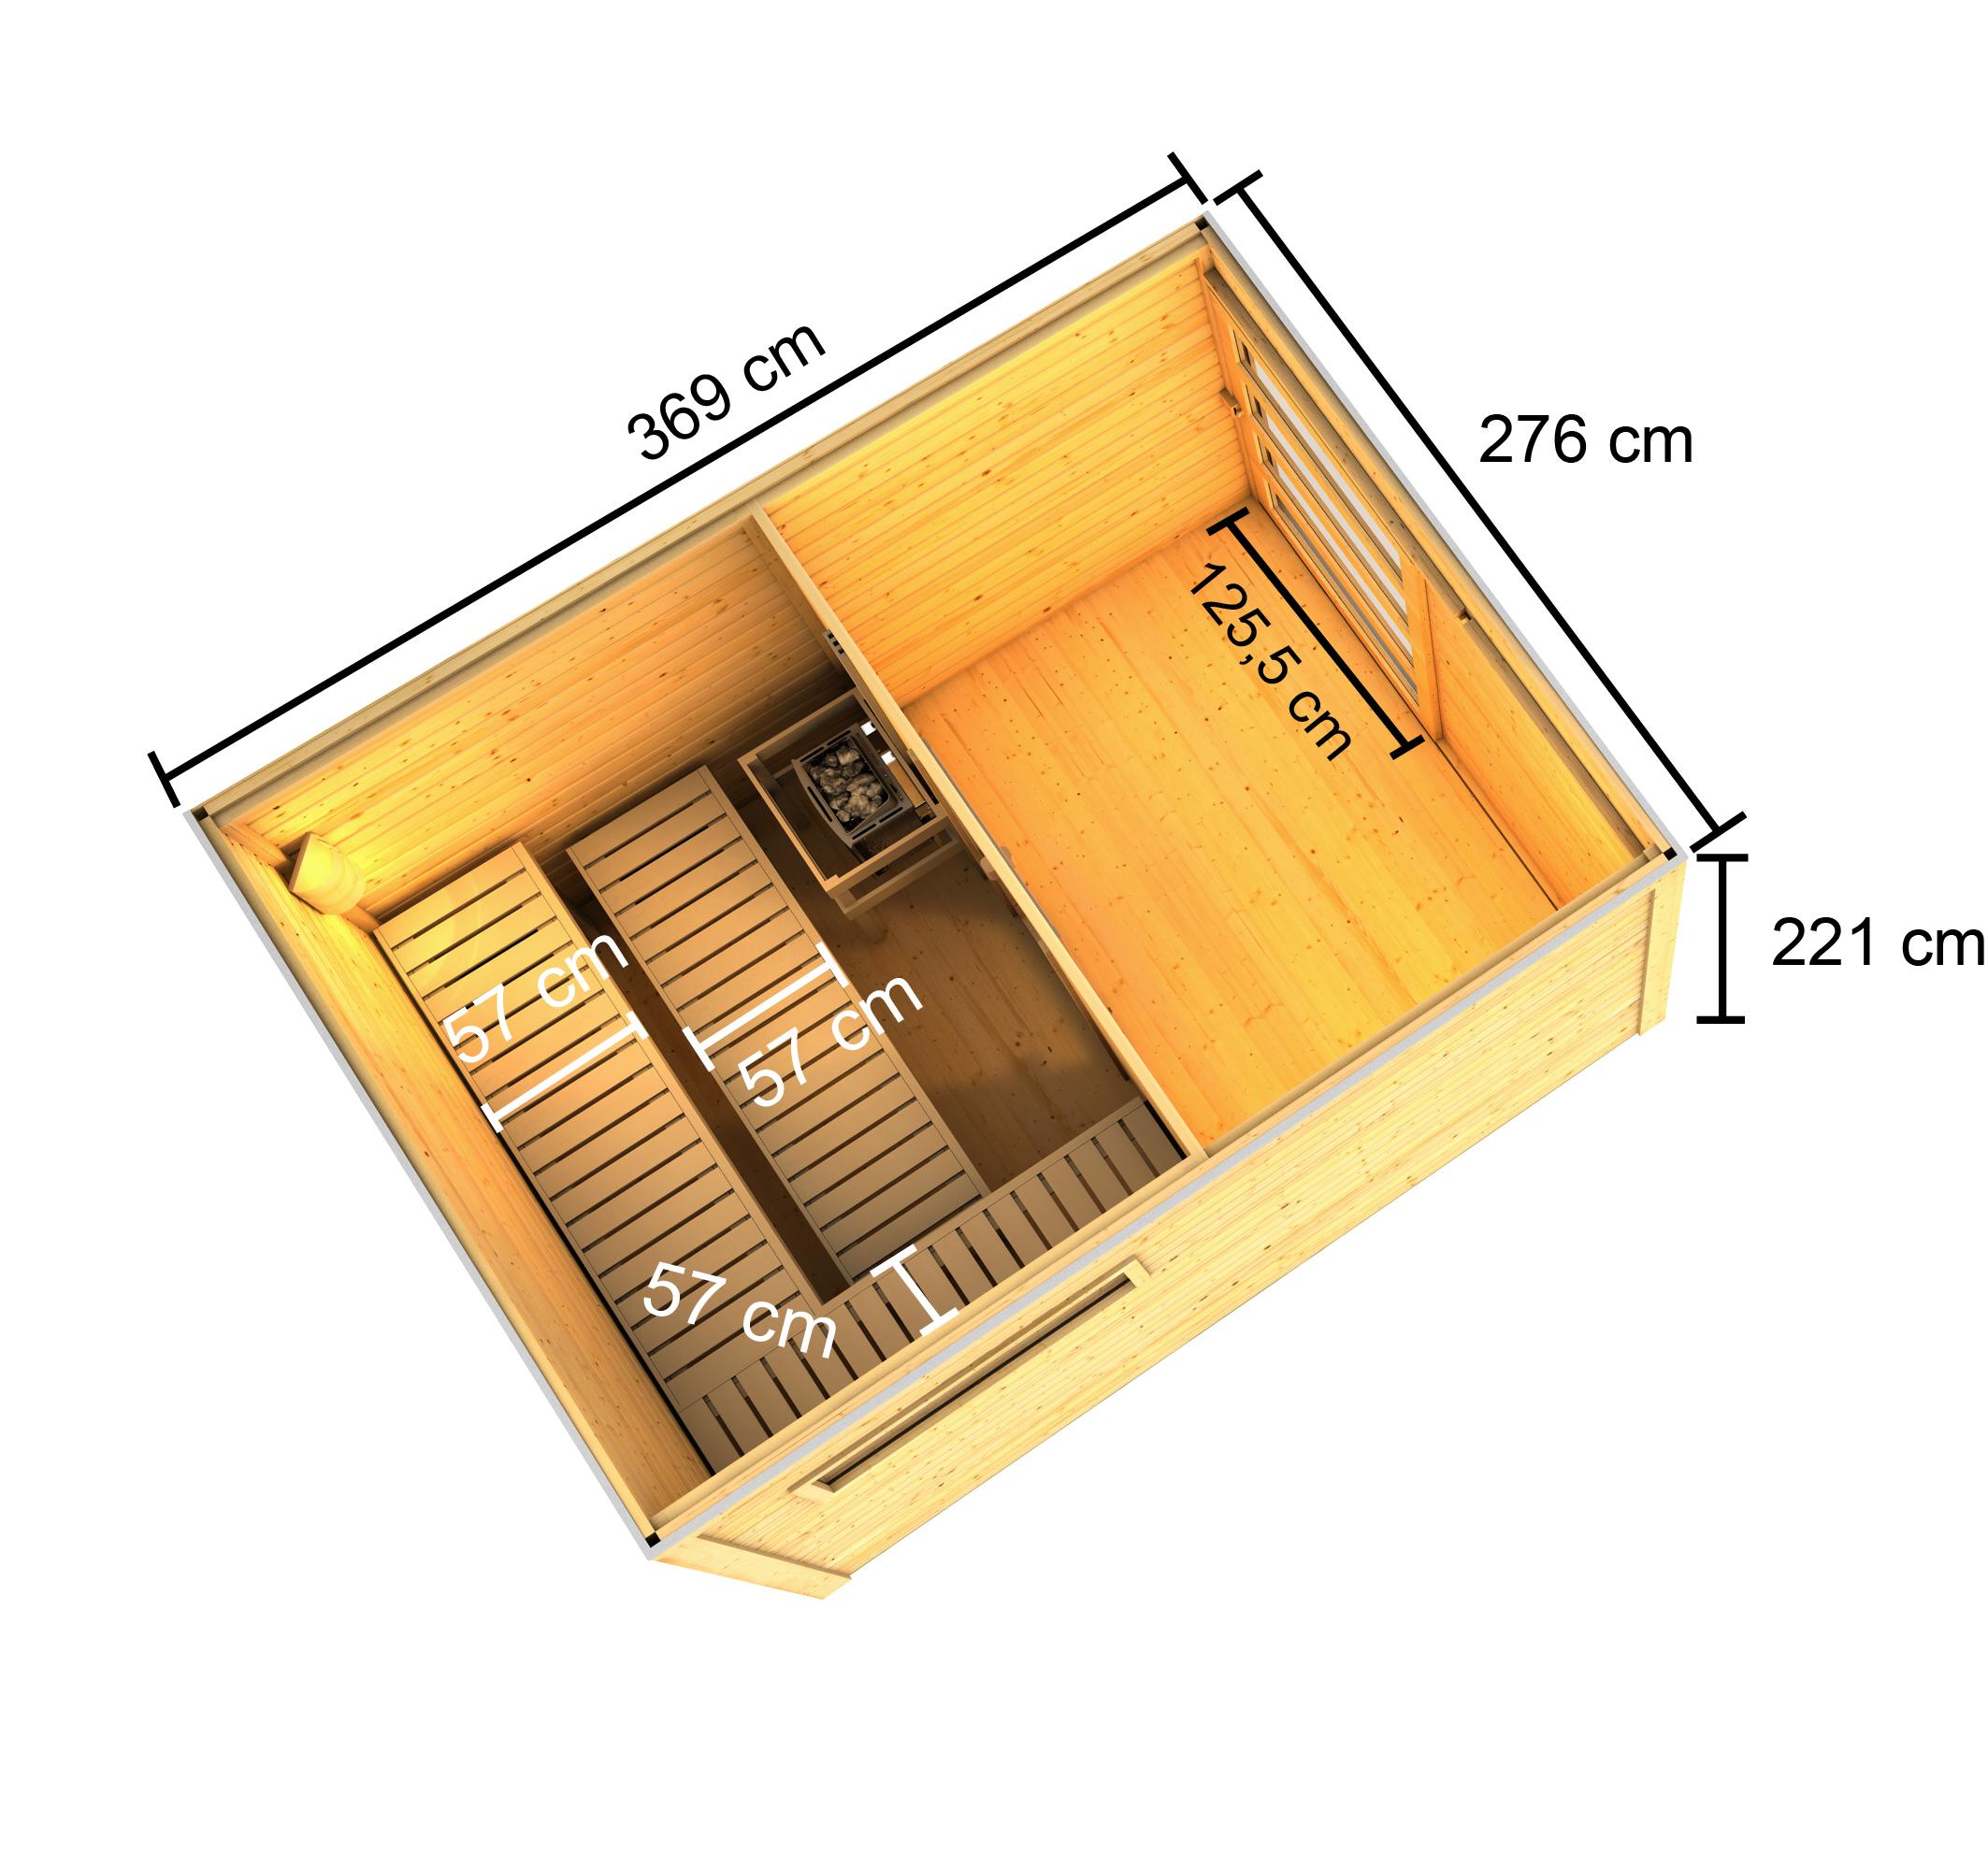 Gartensauna Karibu Saunahaus Caleb natur 38mm Bio Saunaofen 9kW extern Bild 14